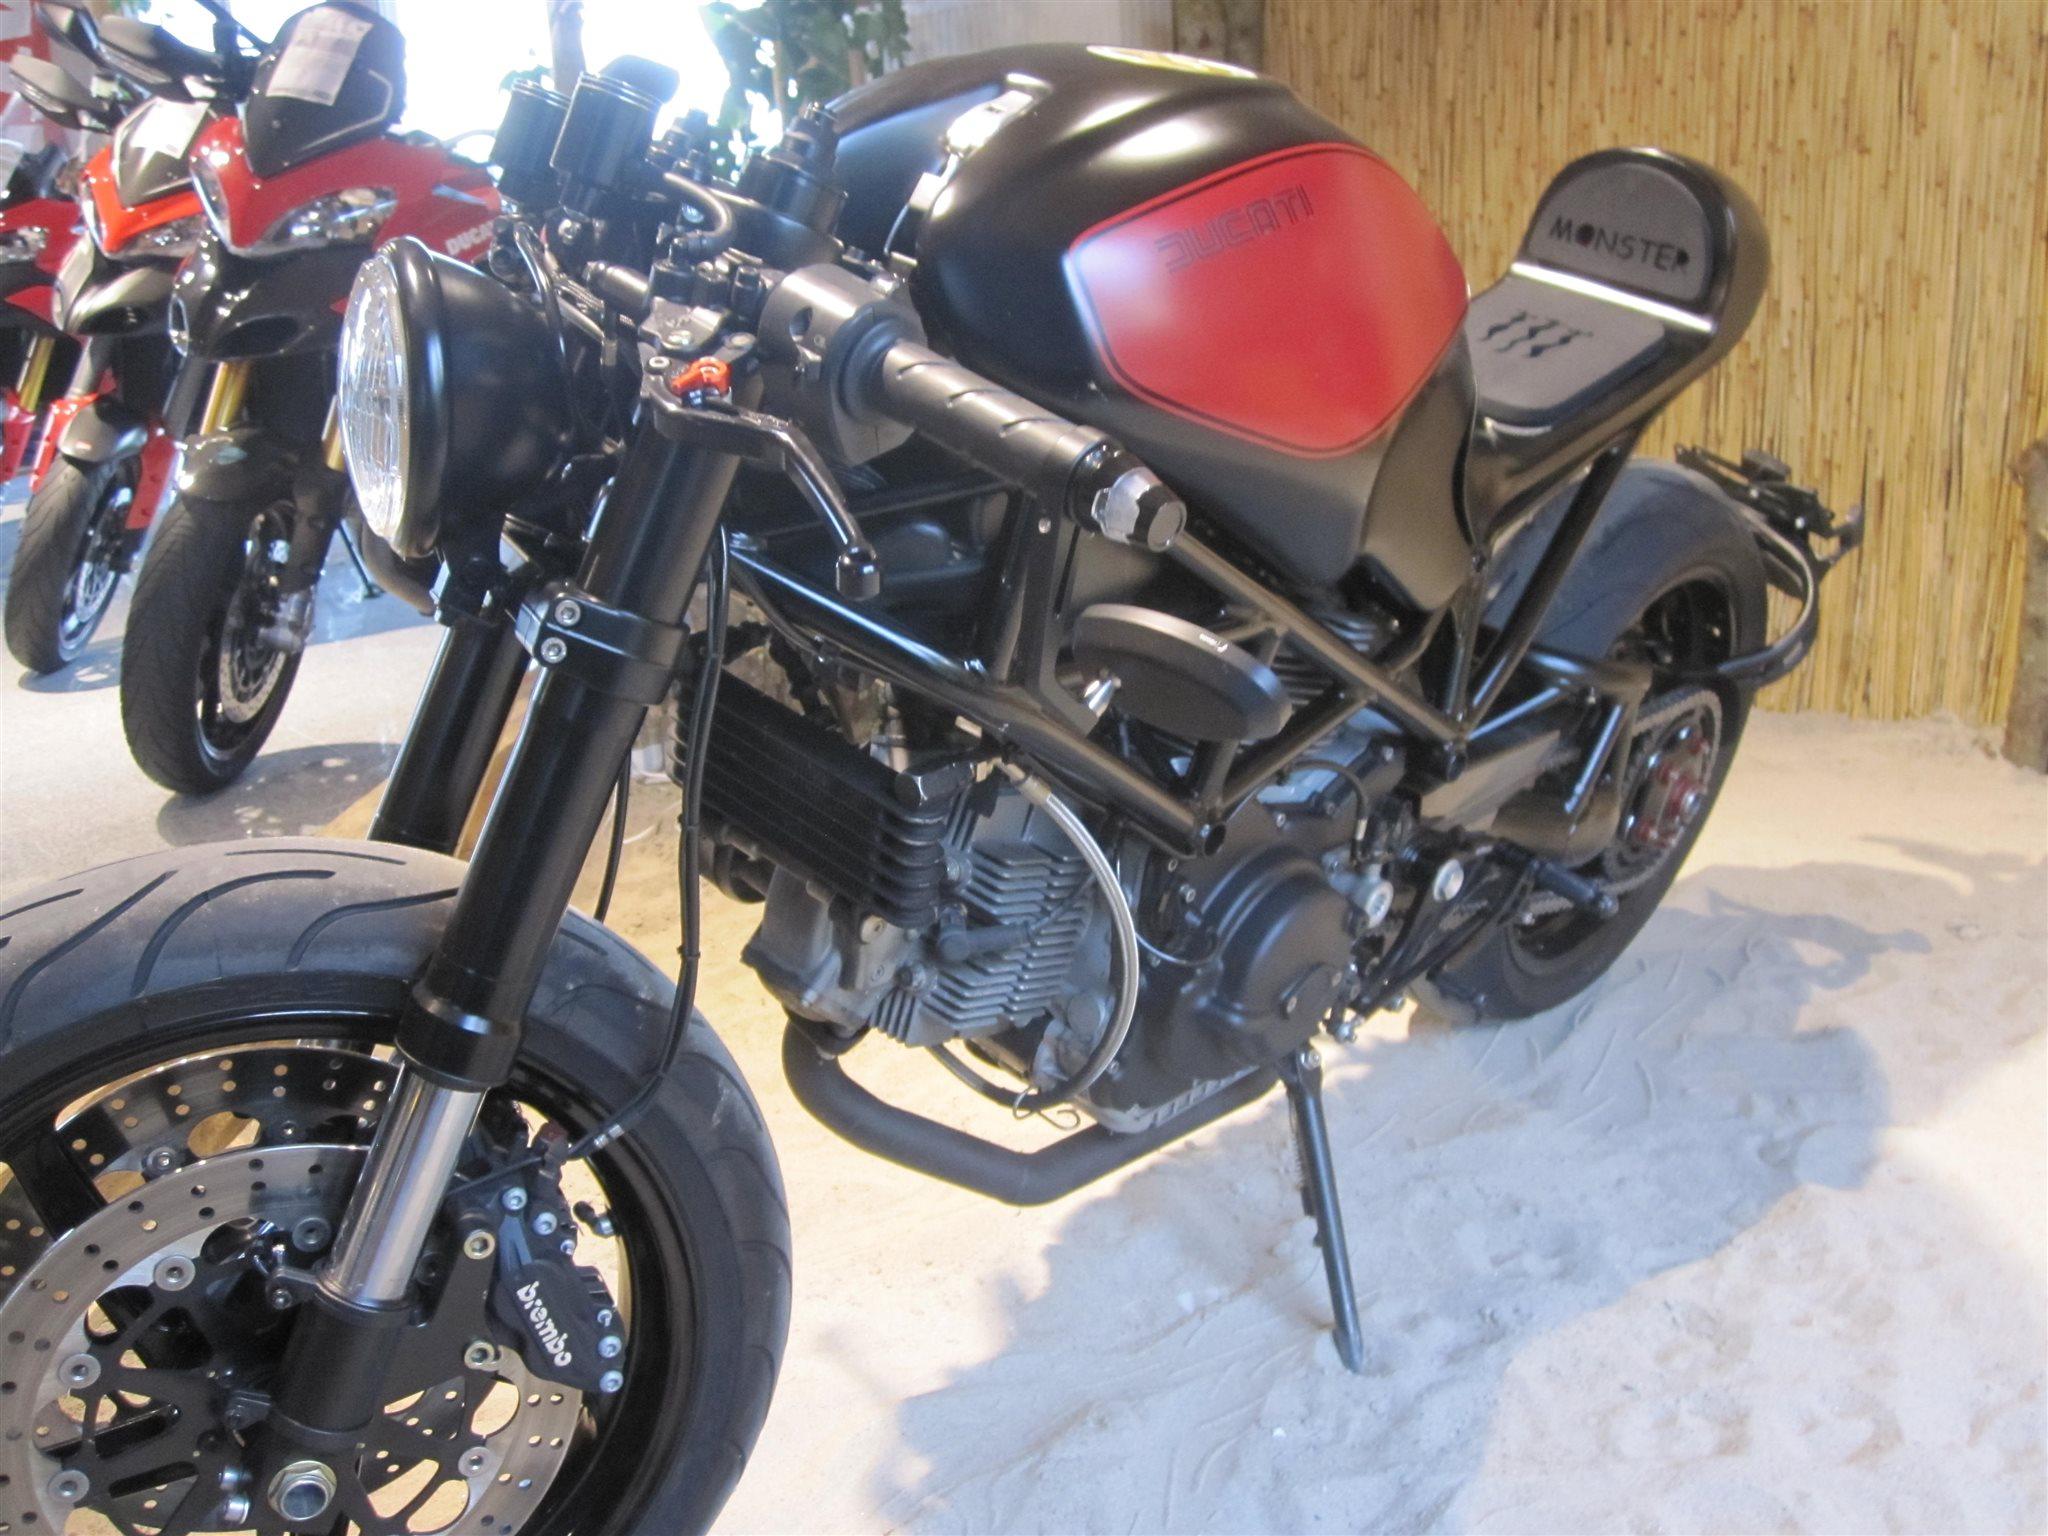 umgebautes motorrad ducati monster s2r 1000 von. Black Bedroom Furniture Sets. Home Design Ideas